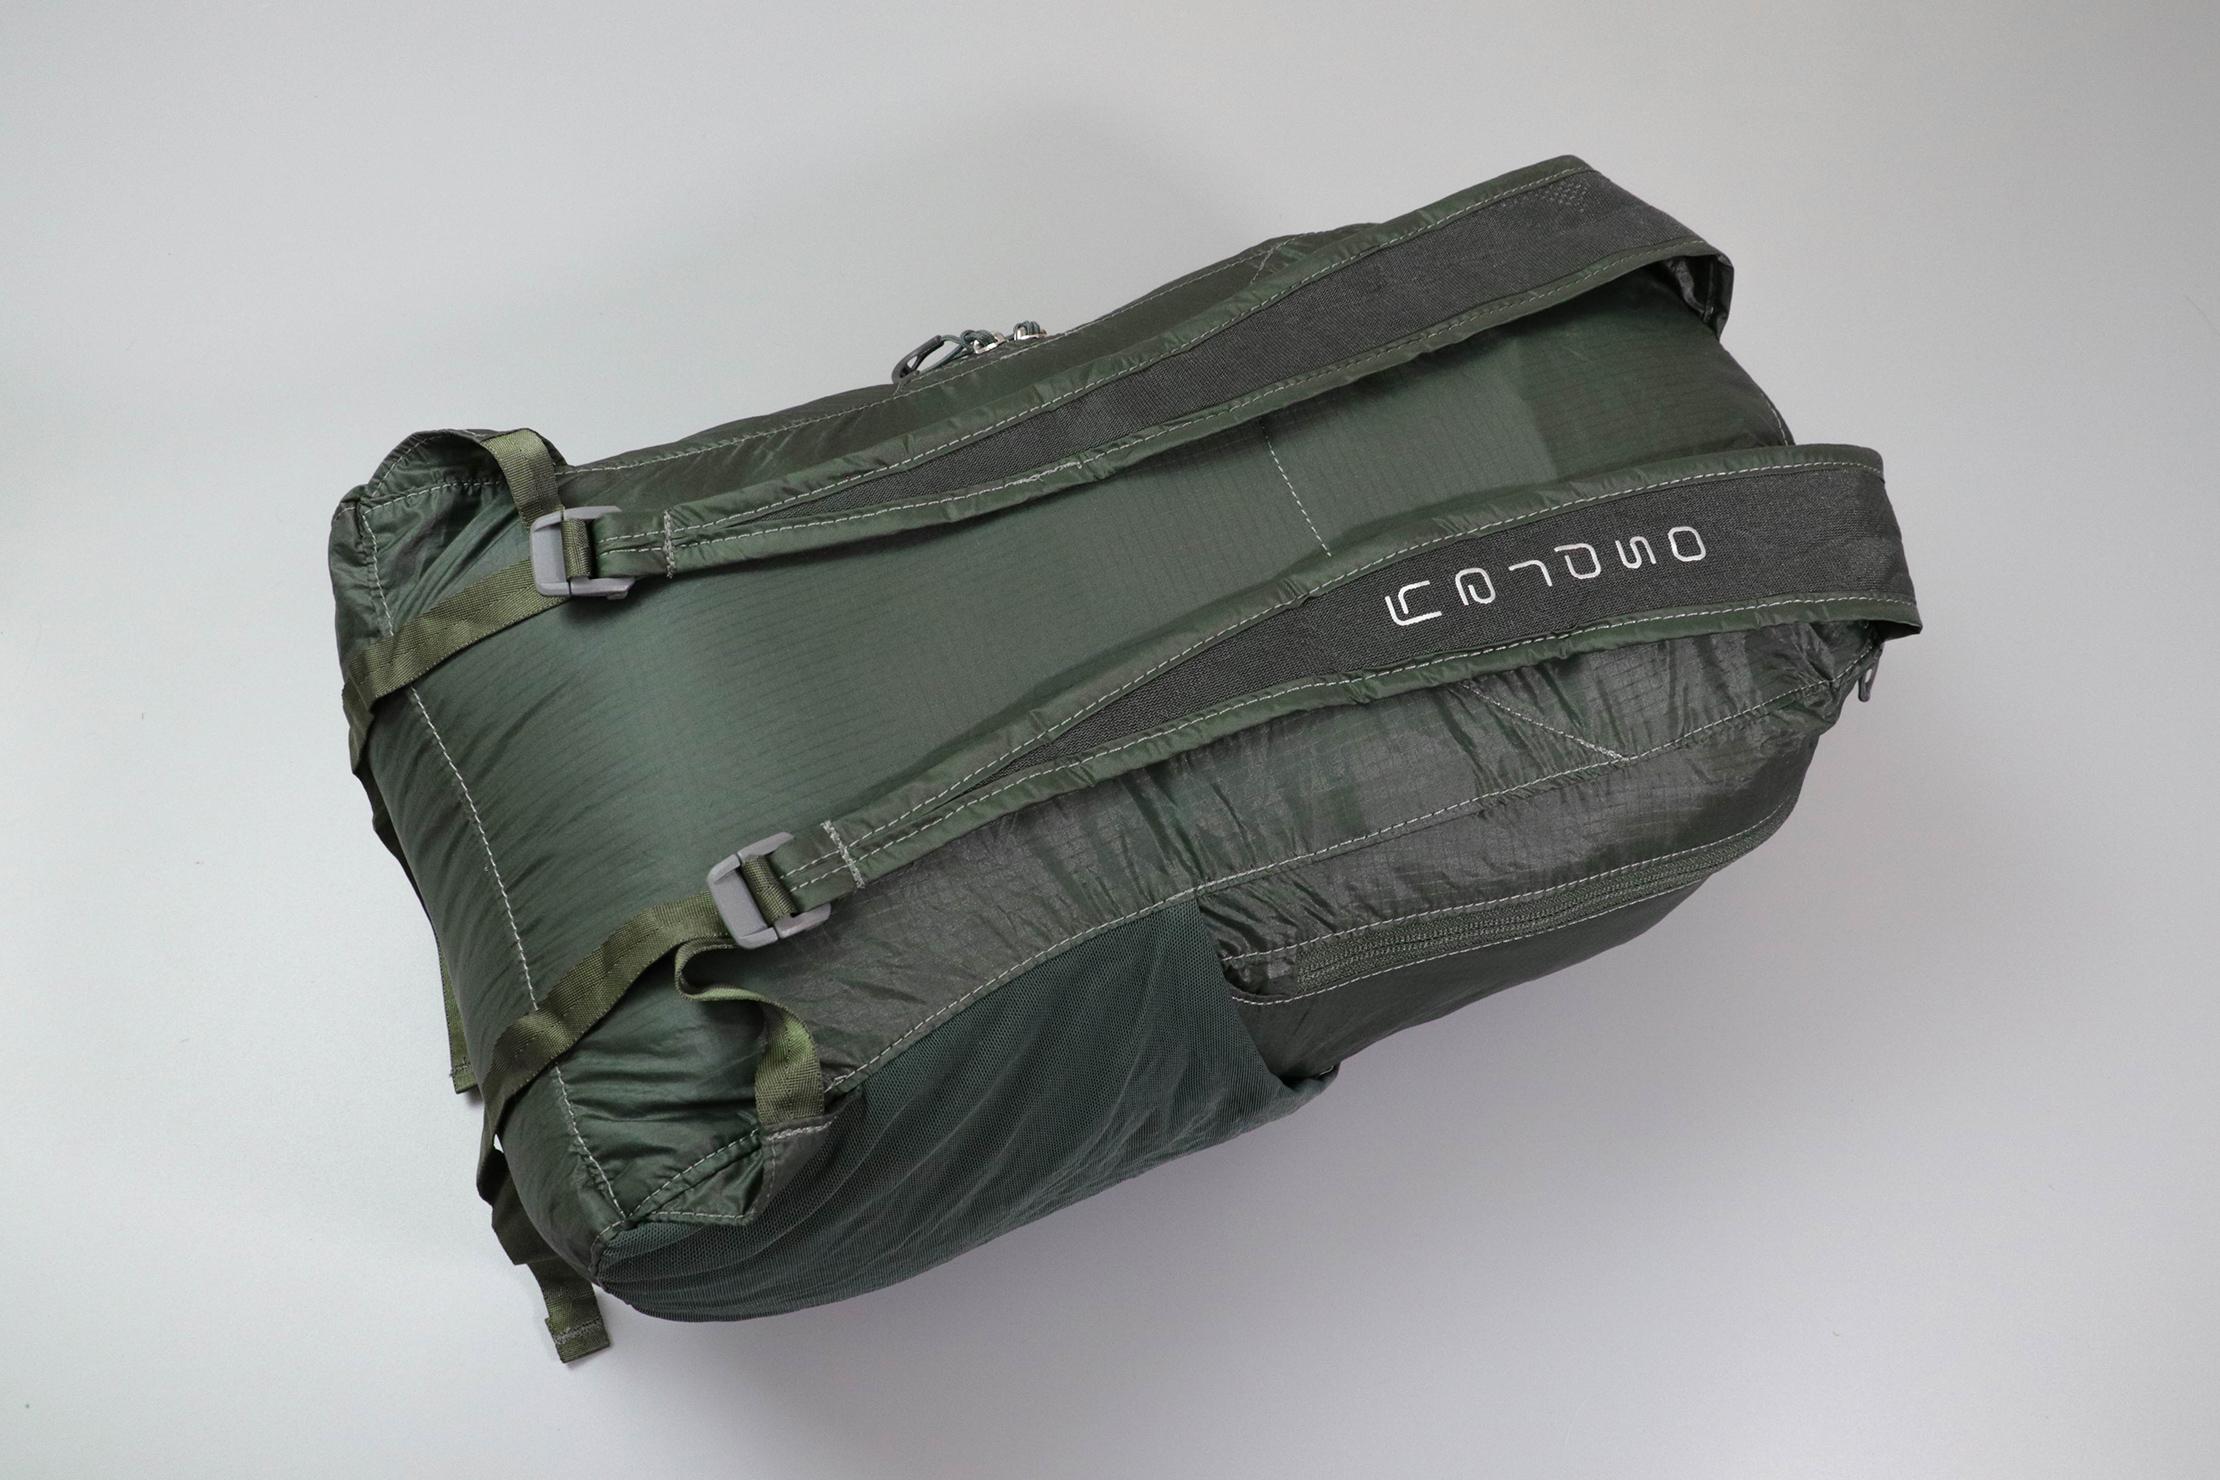 Osprey Ultralight Stuff Pack Harness System